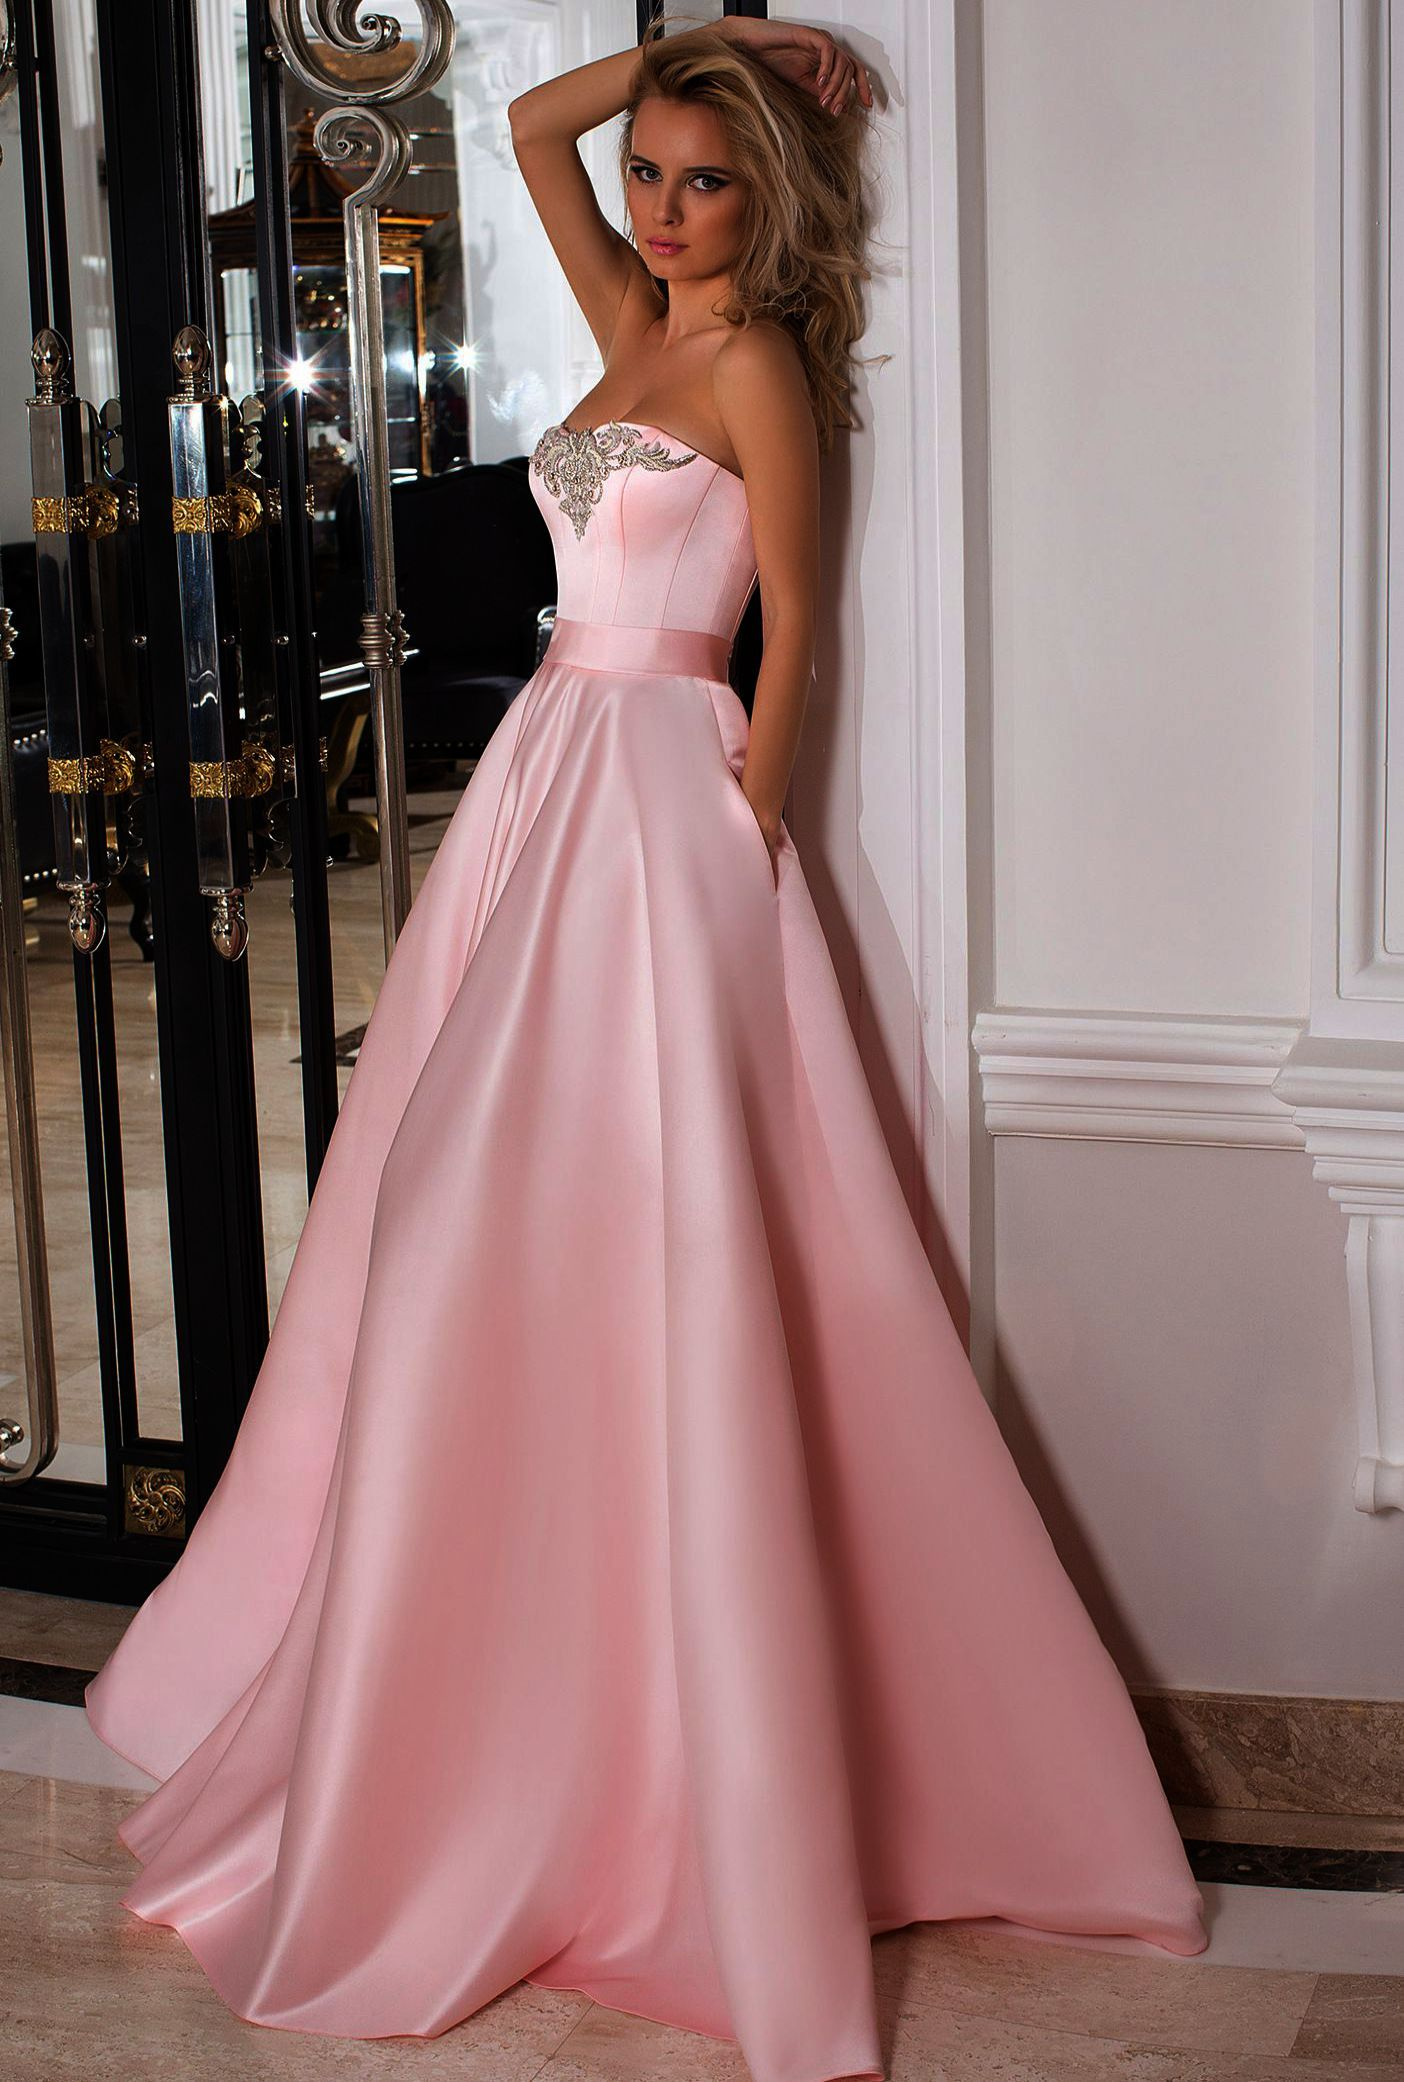 Lava Ring Womens Mermaid Crystal Beaded Satin prom dress